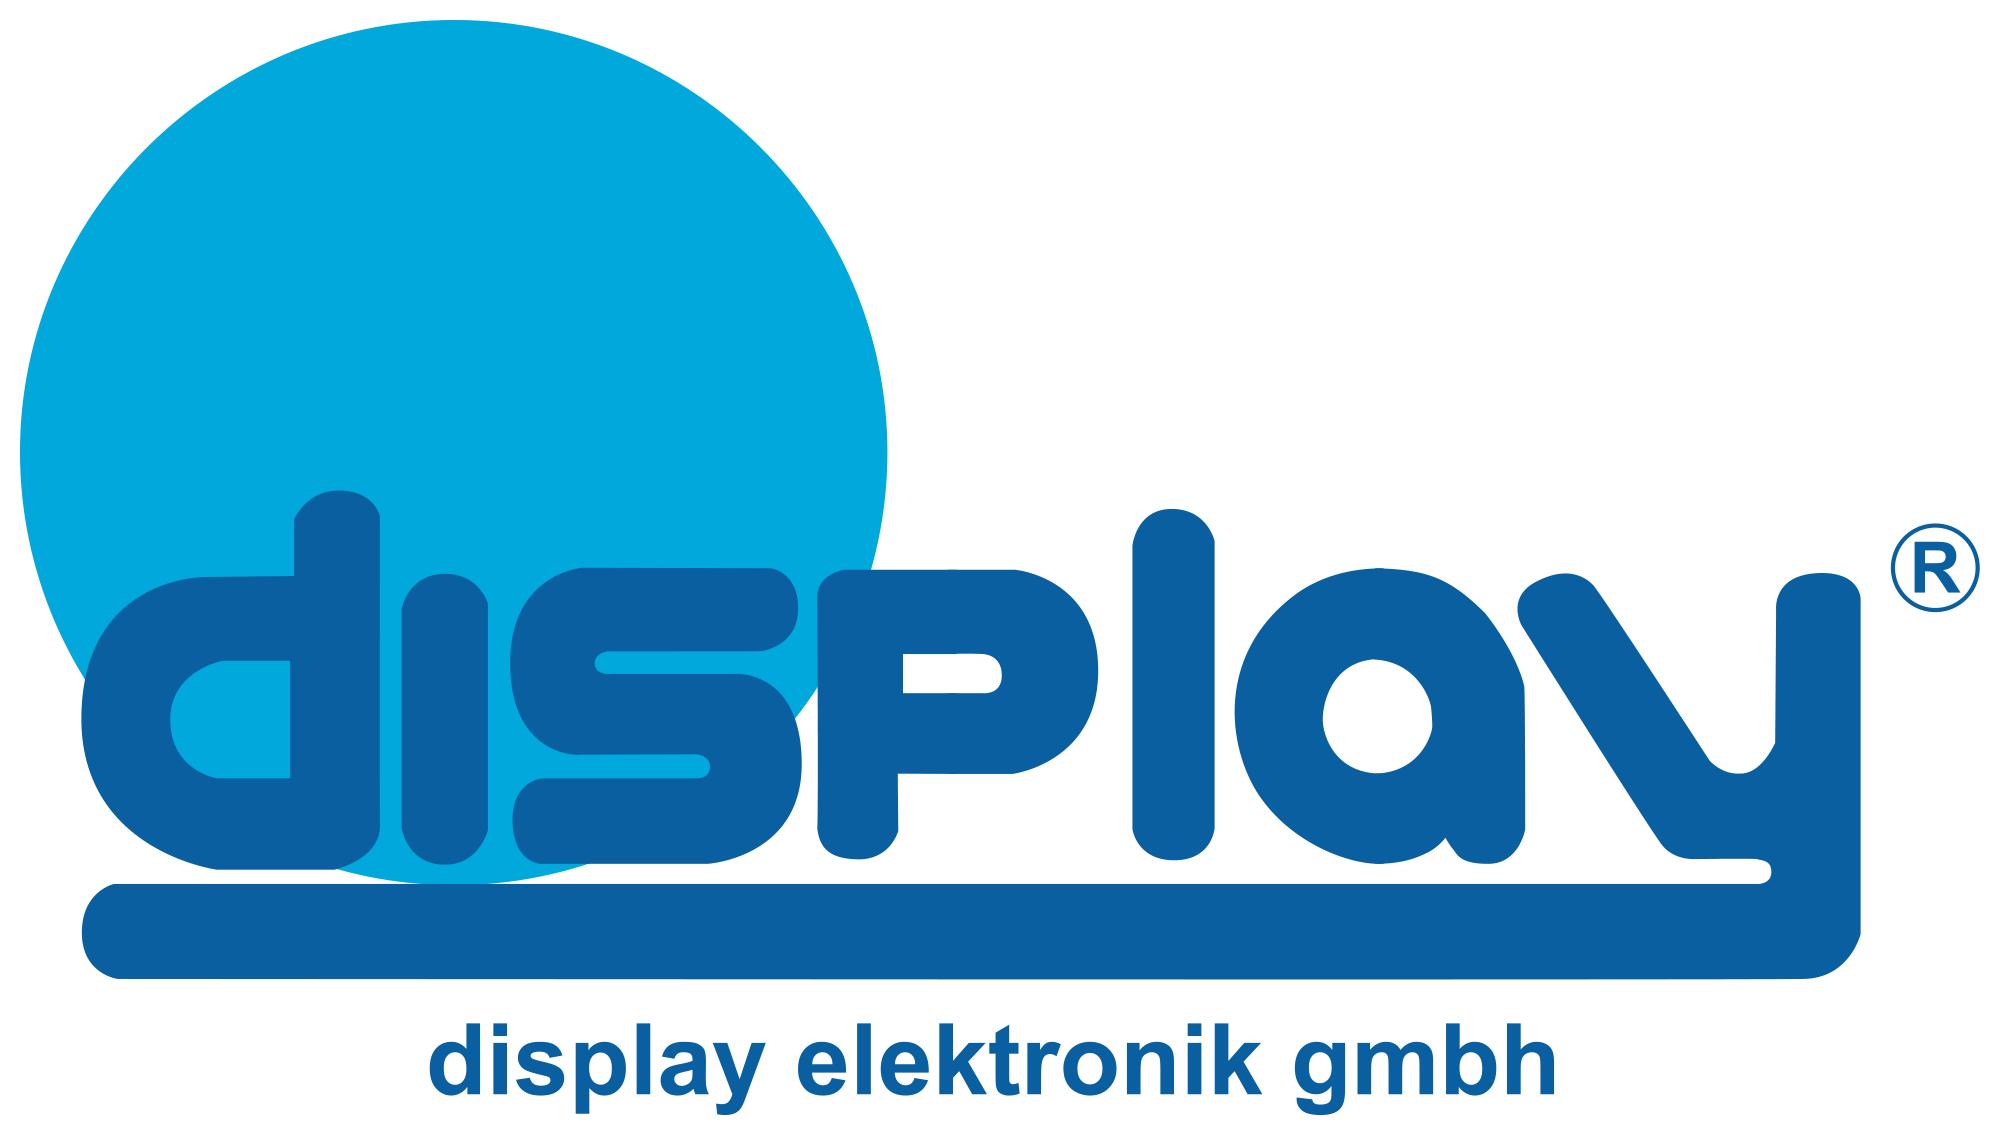 DISPLAY ELEKTRONIK